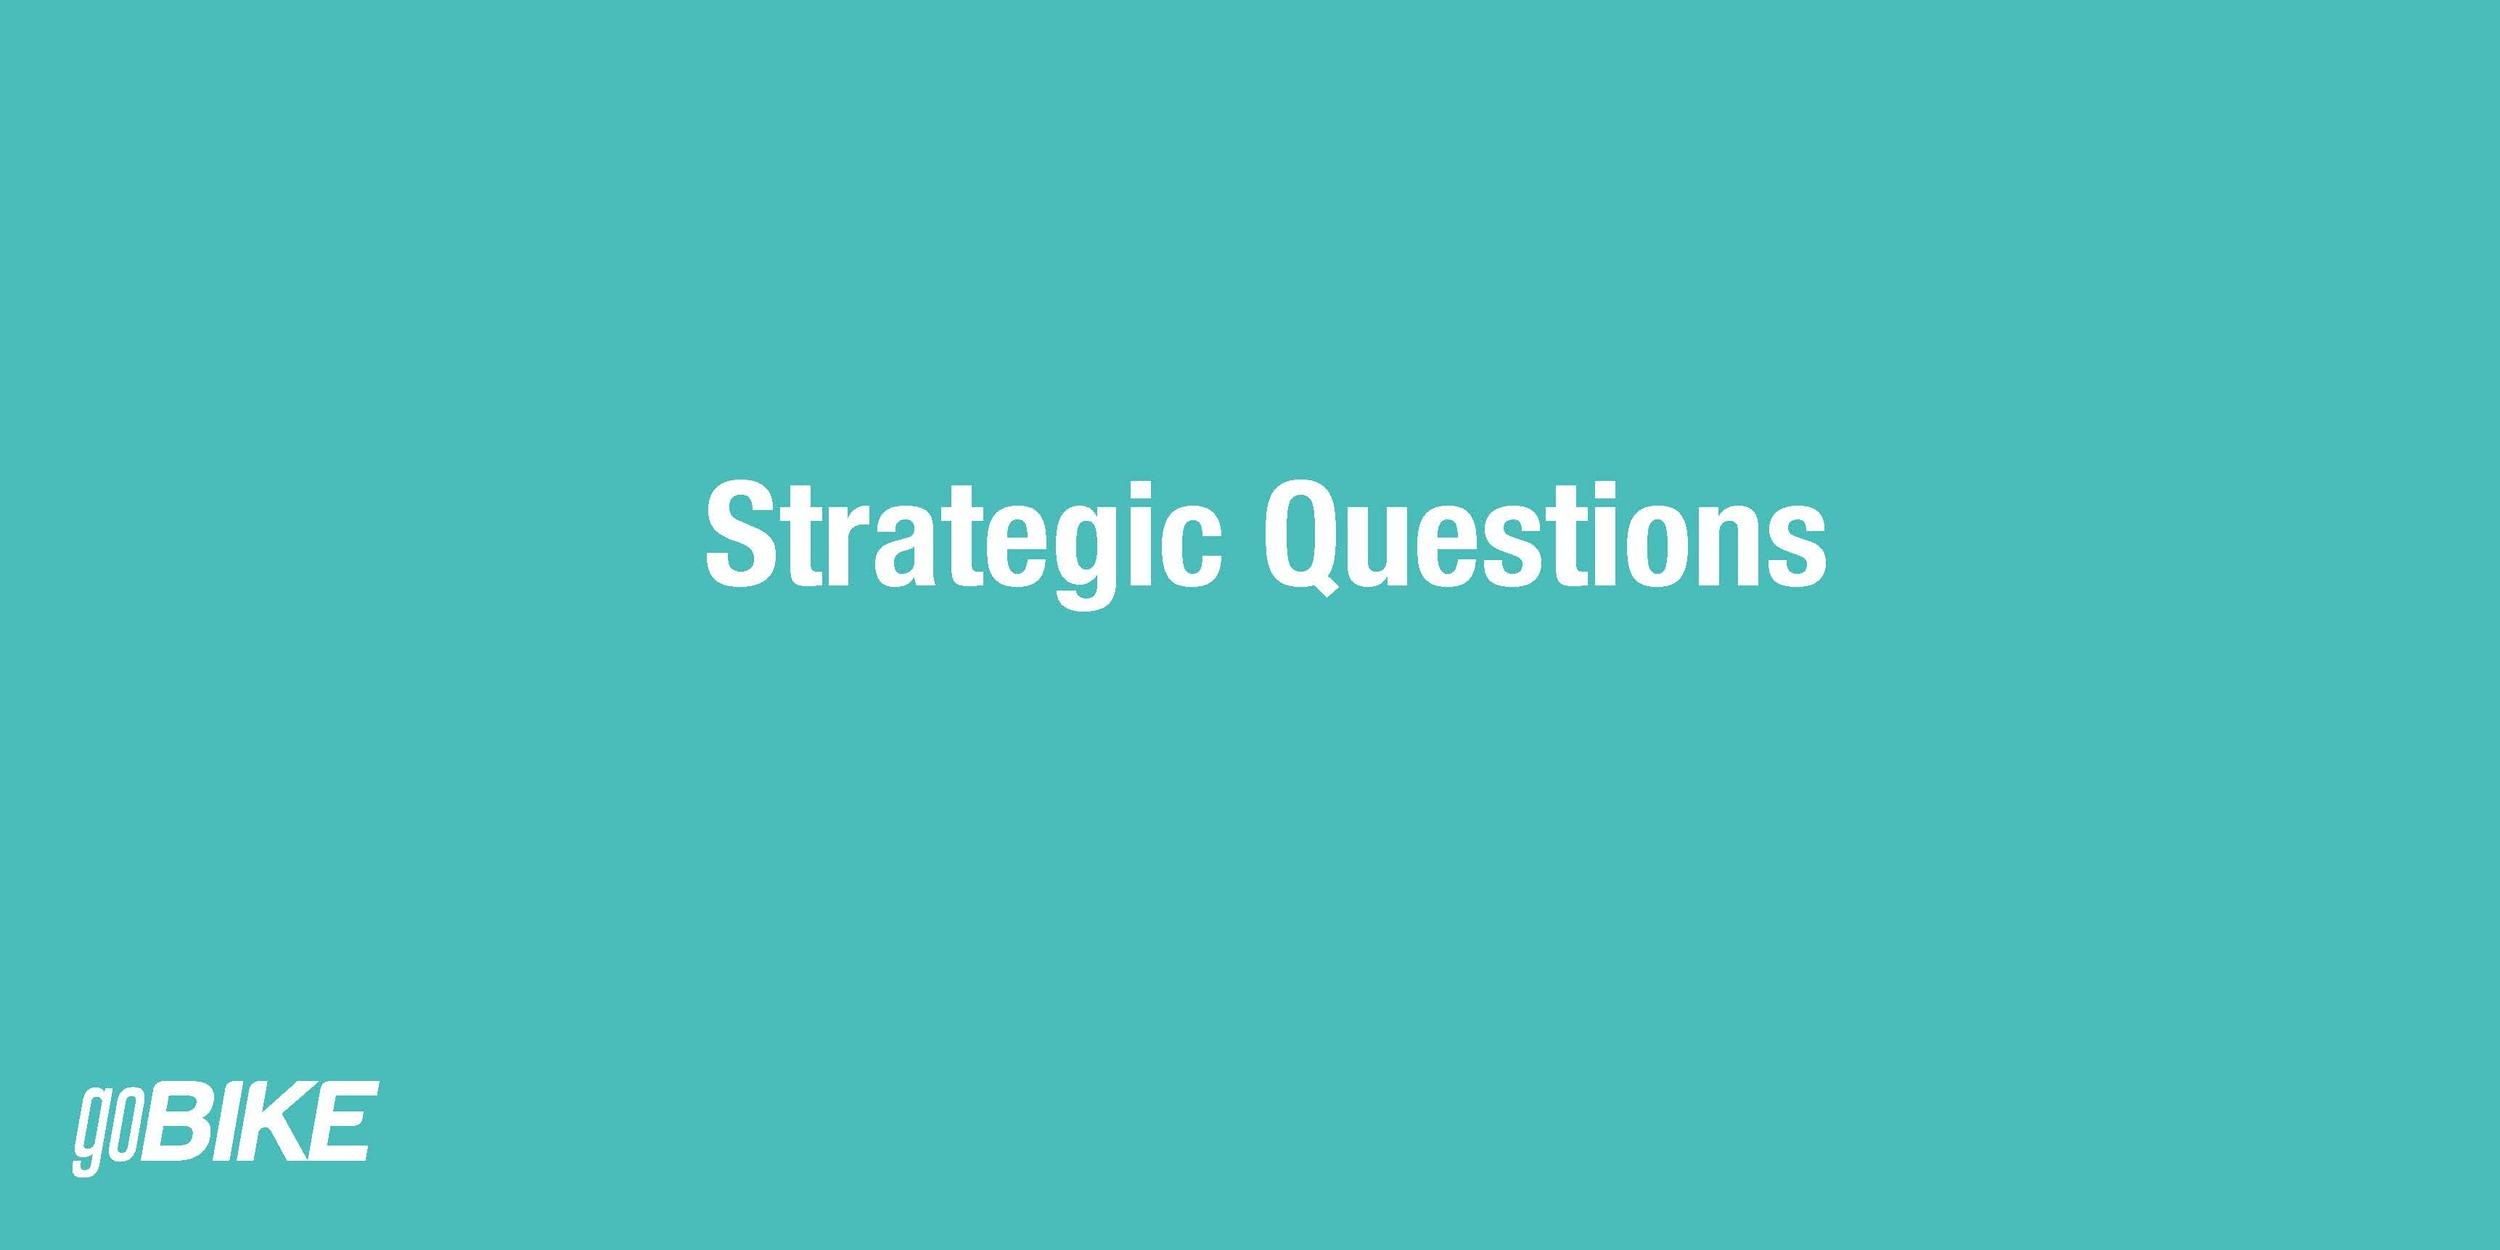 z_strategic_questions_Page_09.jpg